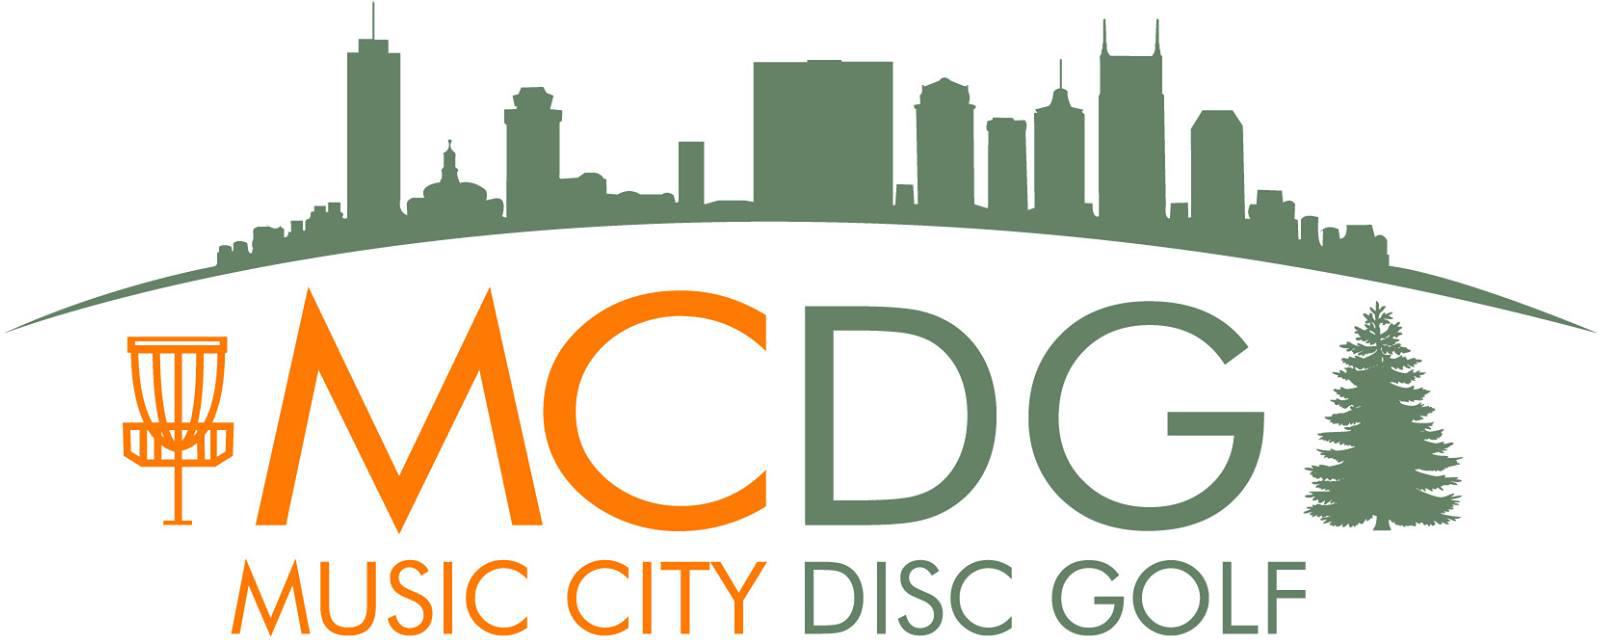 MCDG large logo with city